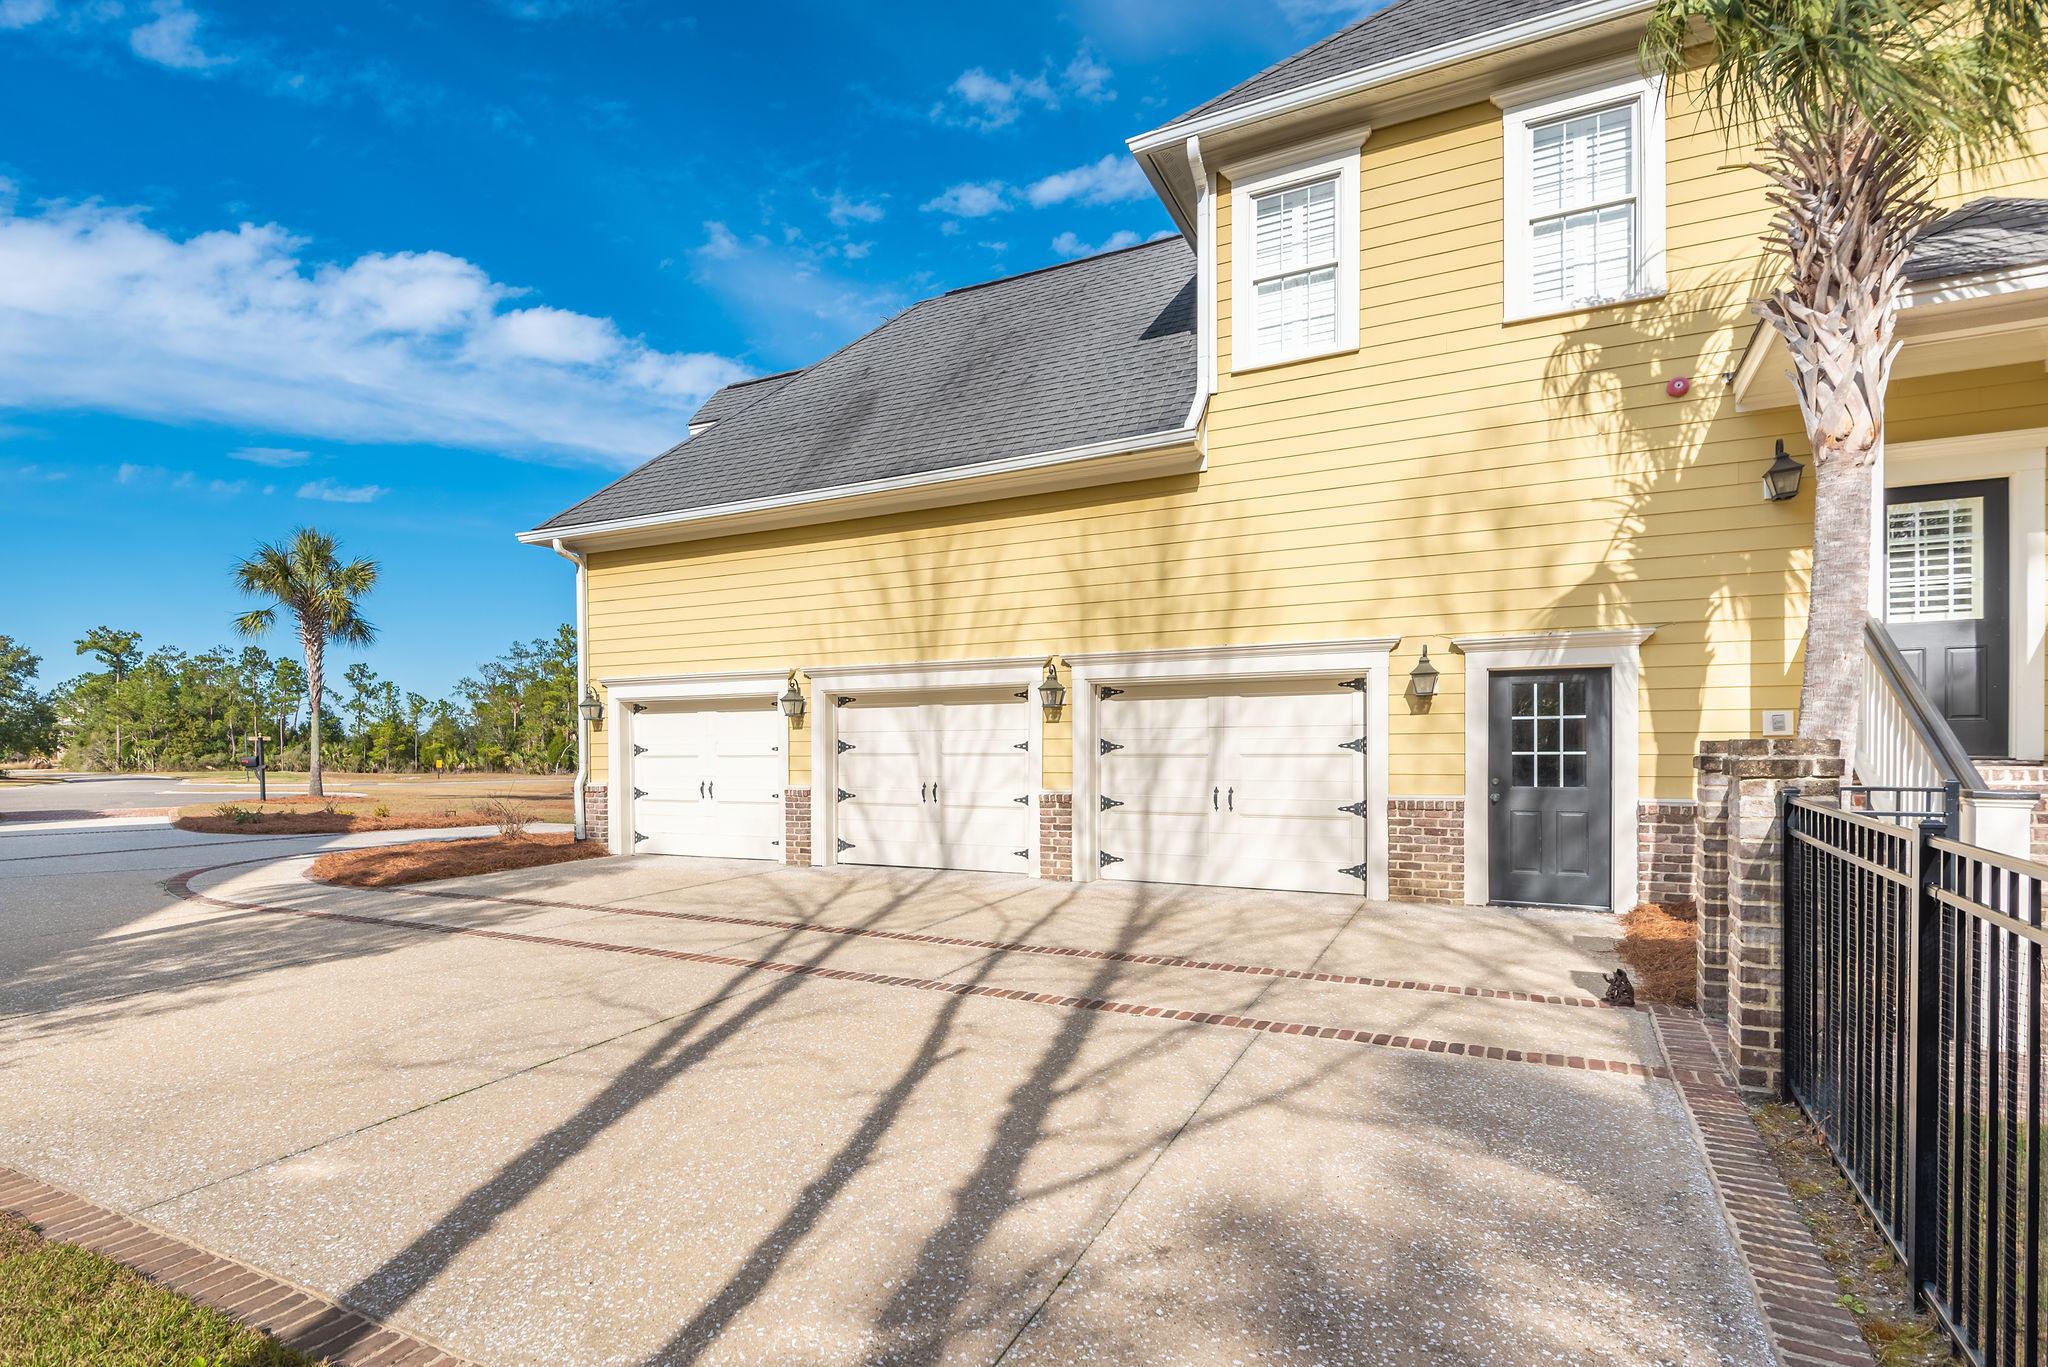 Dunes West Homes For Sale - 1305 King Bird, Mount Pleasant, SC - 22